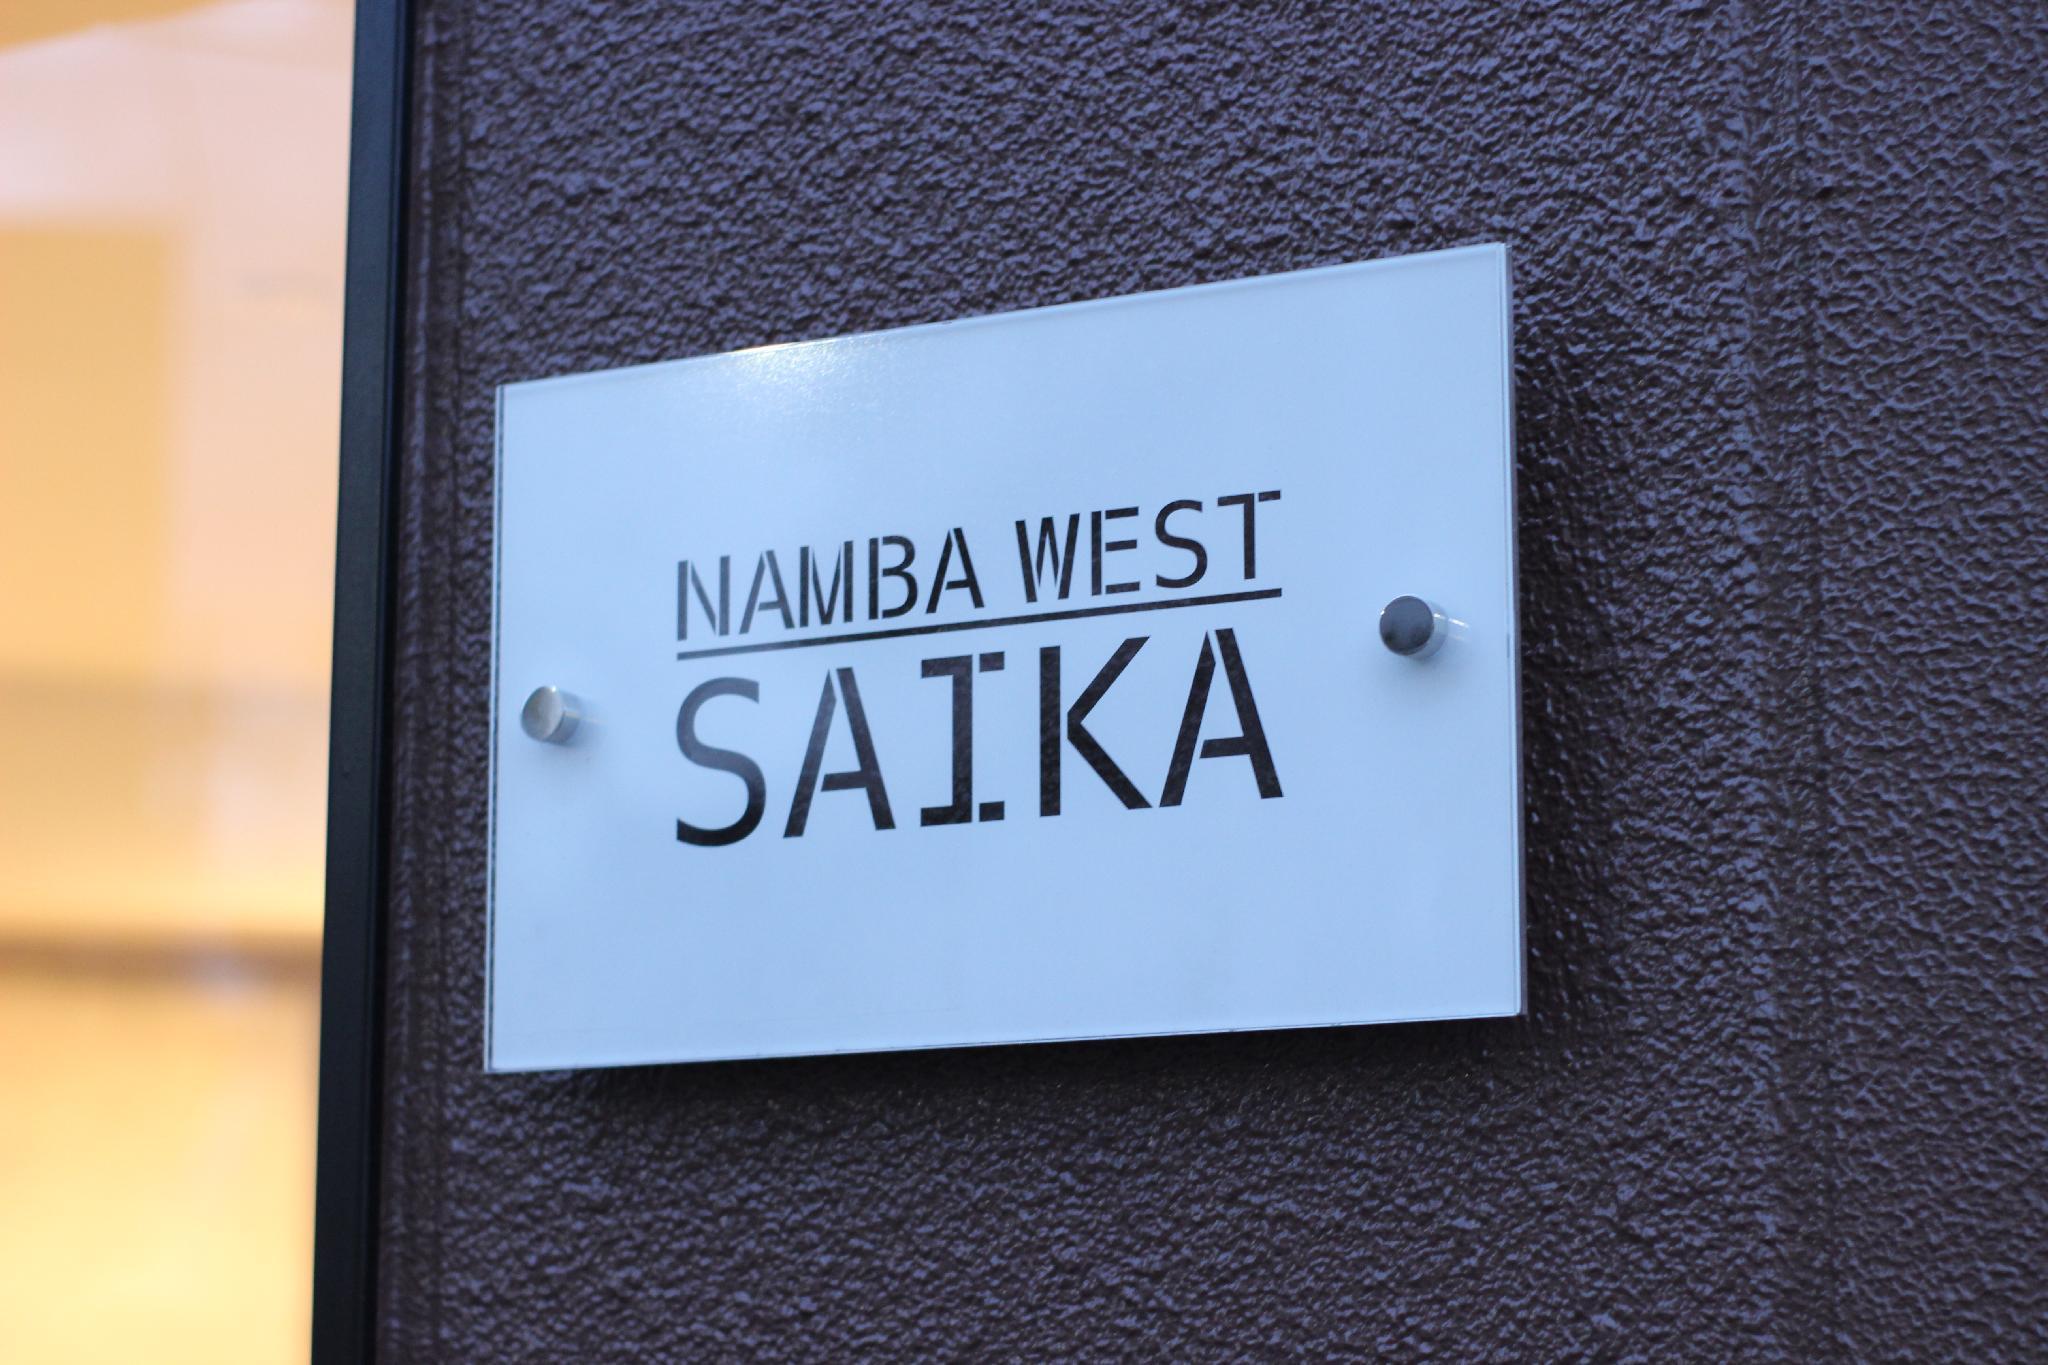 Namba West SAIKA